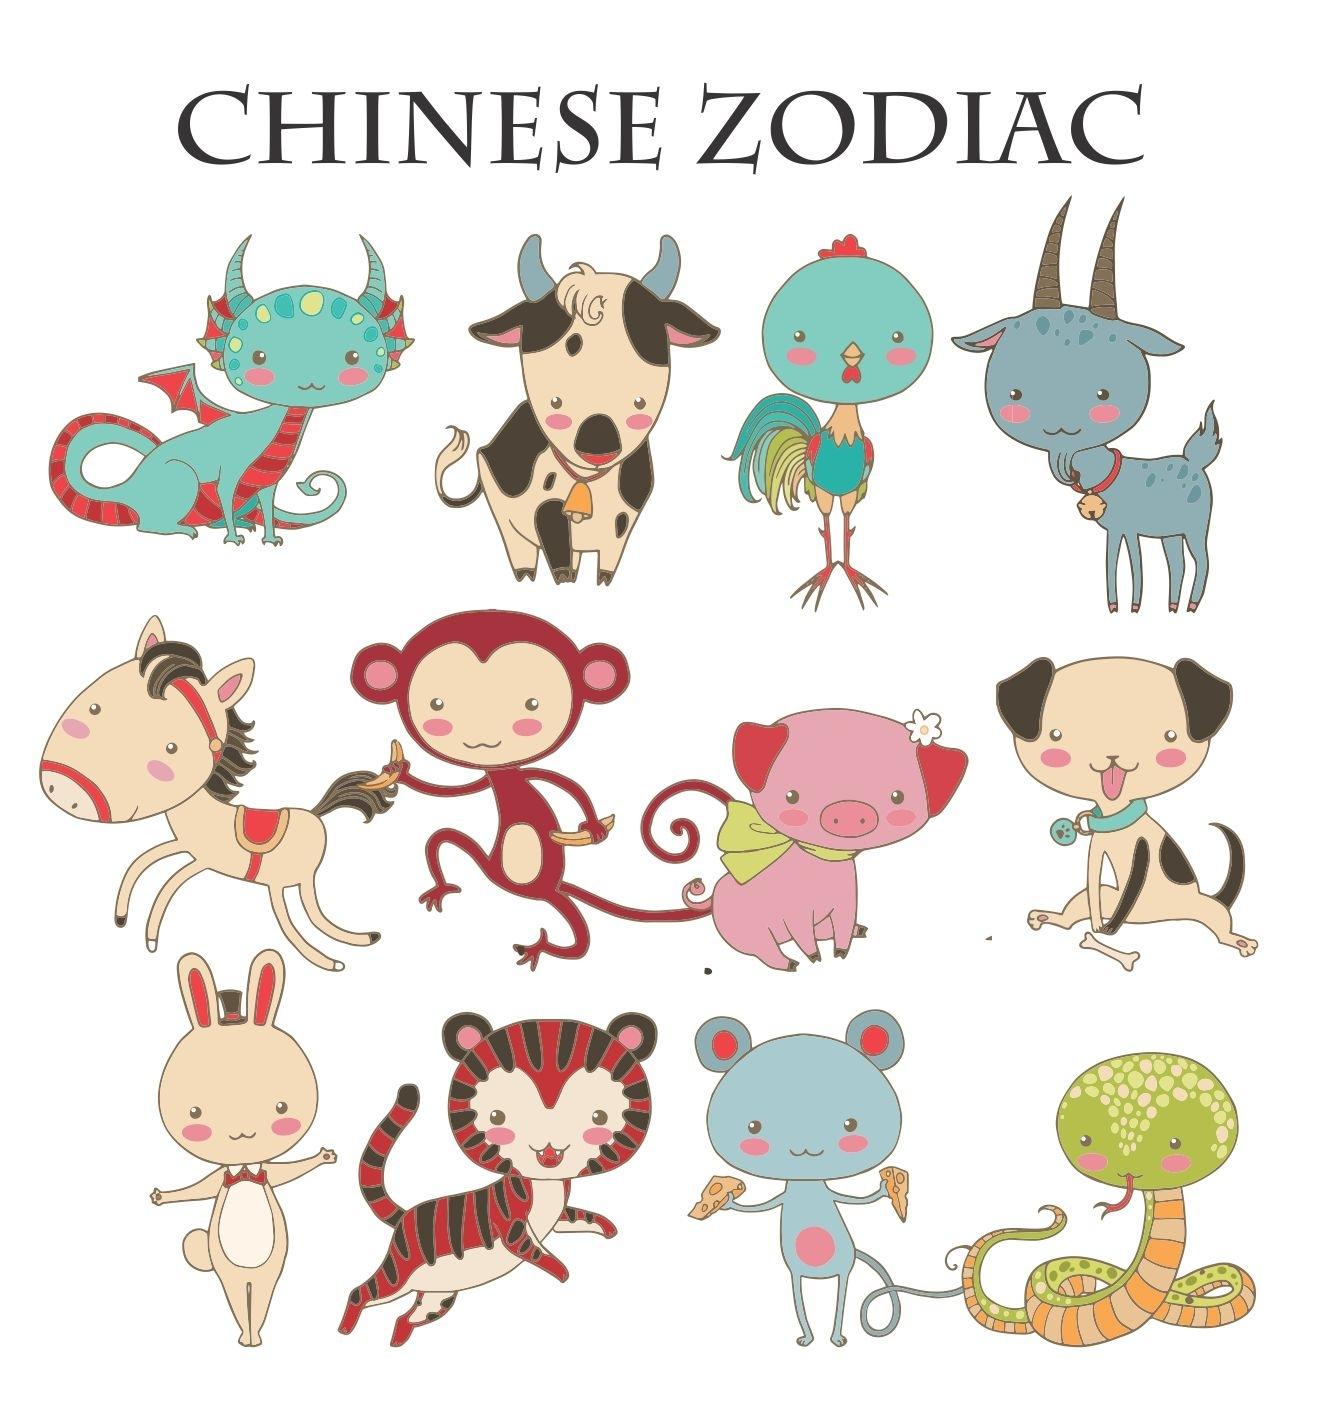 Chinese Zodiac Kitchen Towel - Full Print (Personalized)